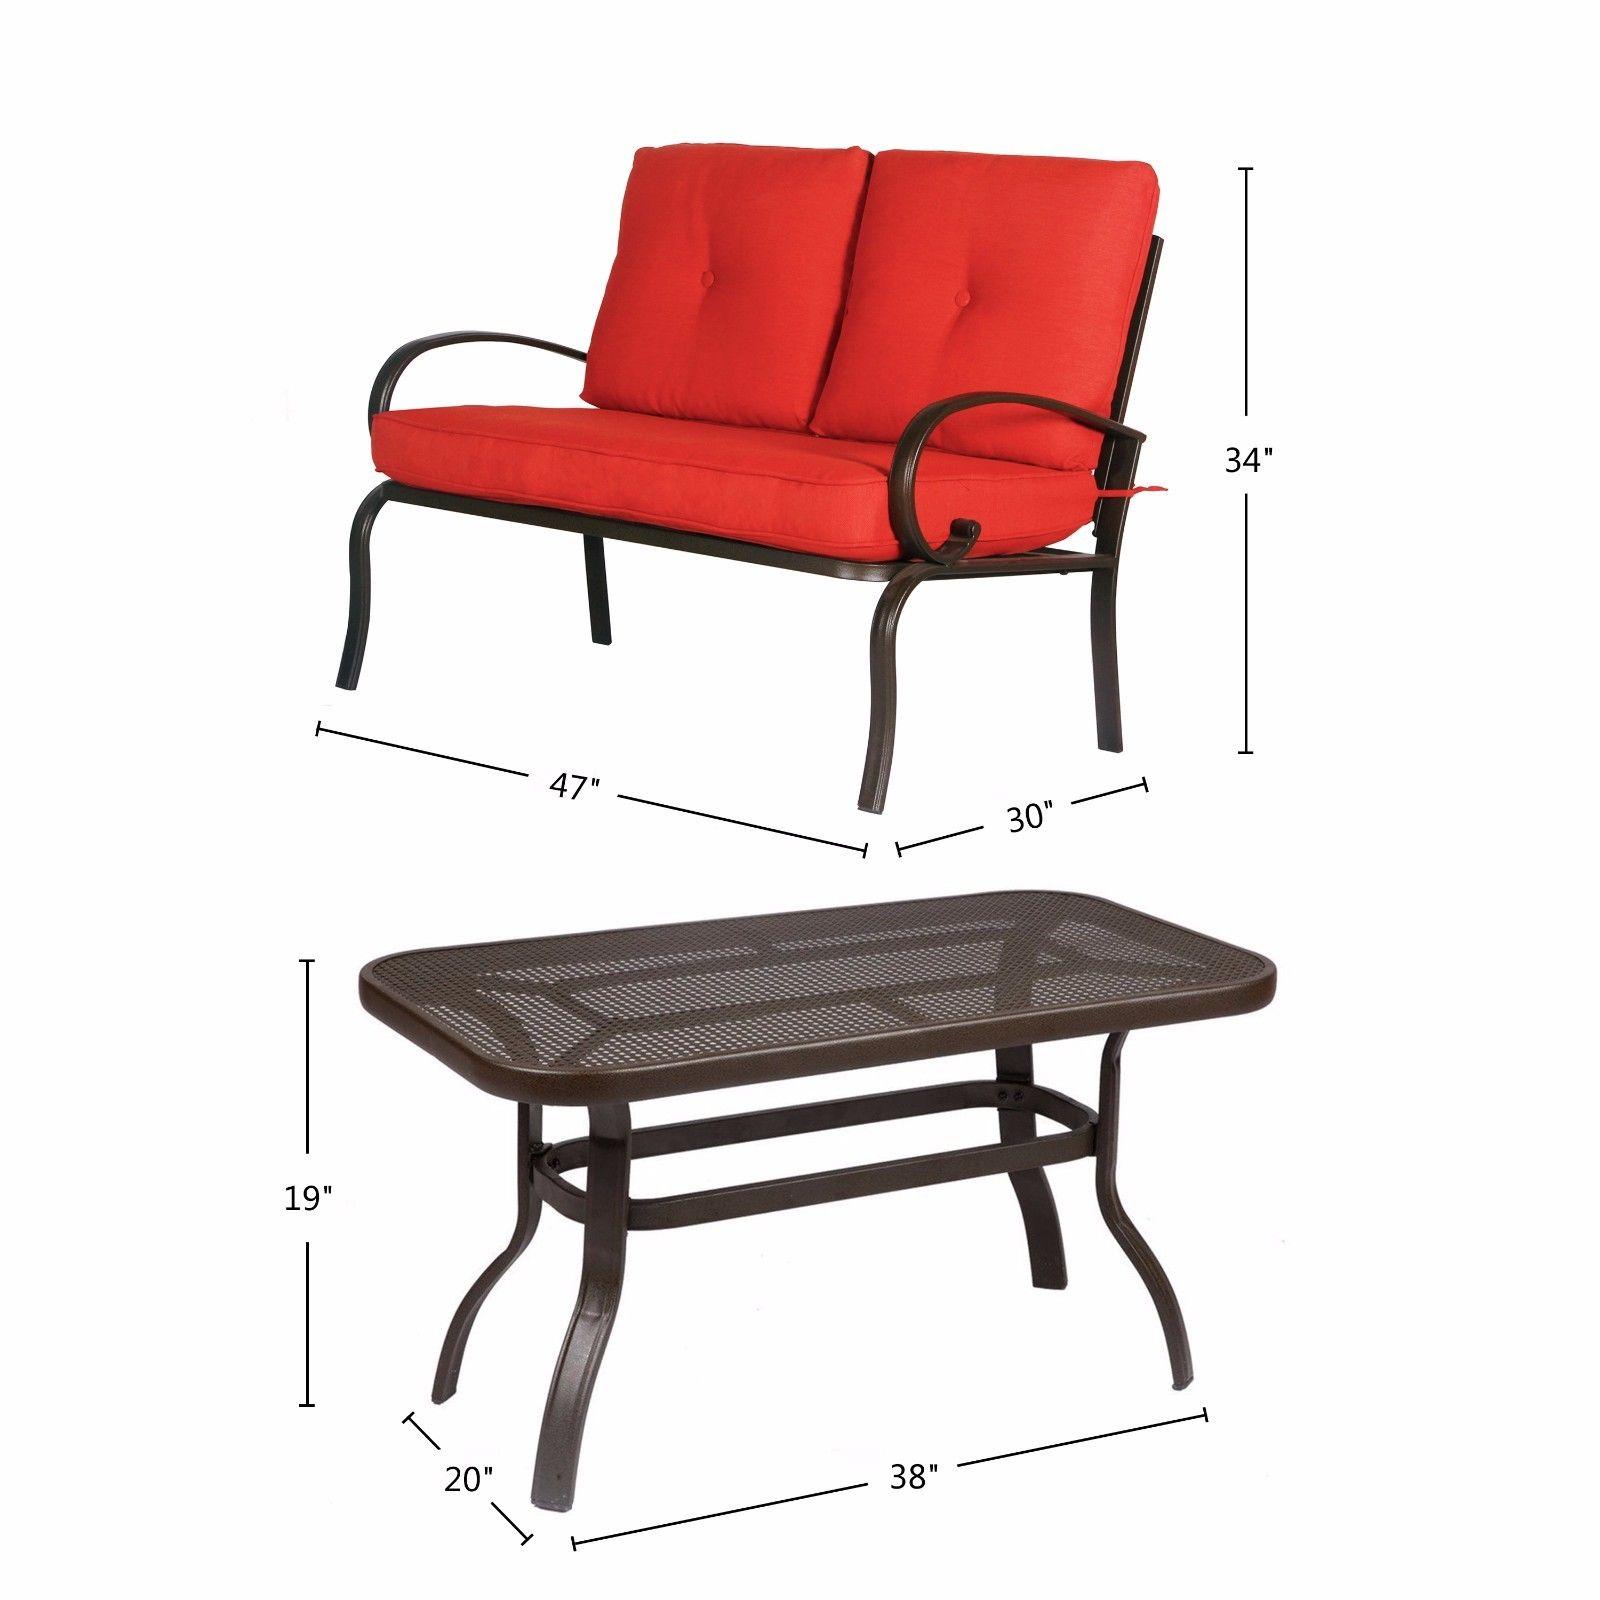 3 Piece Outdoor Furniture Patio Conversation Set Loveseat